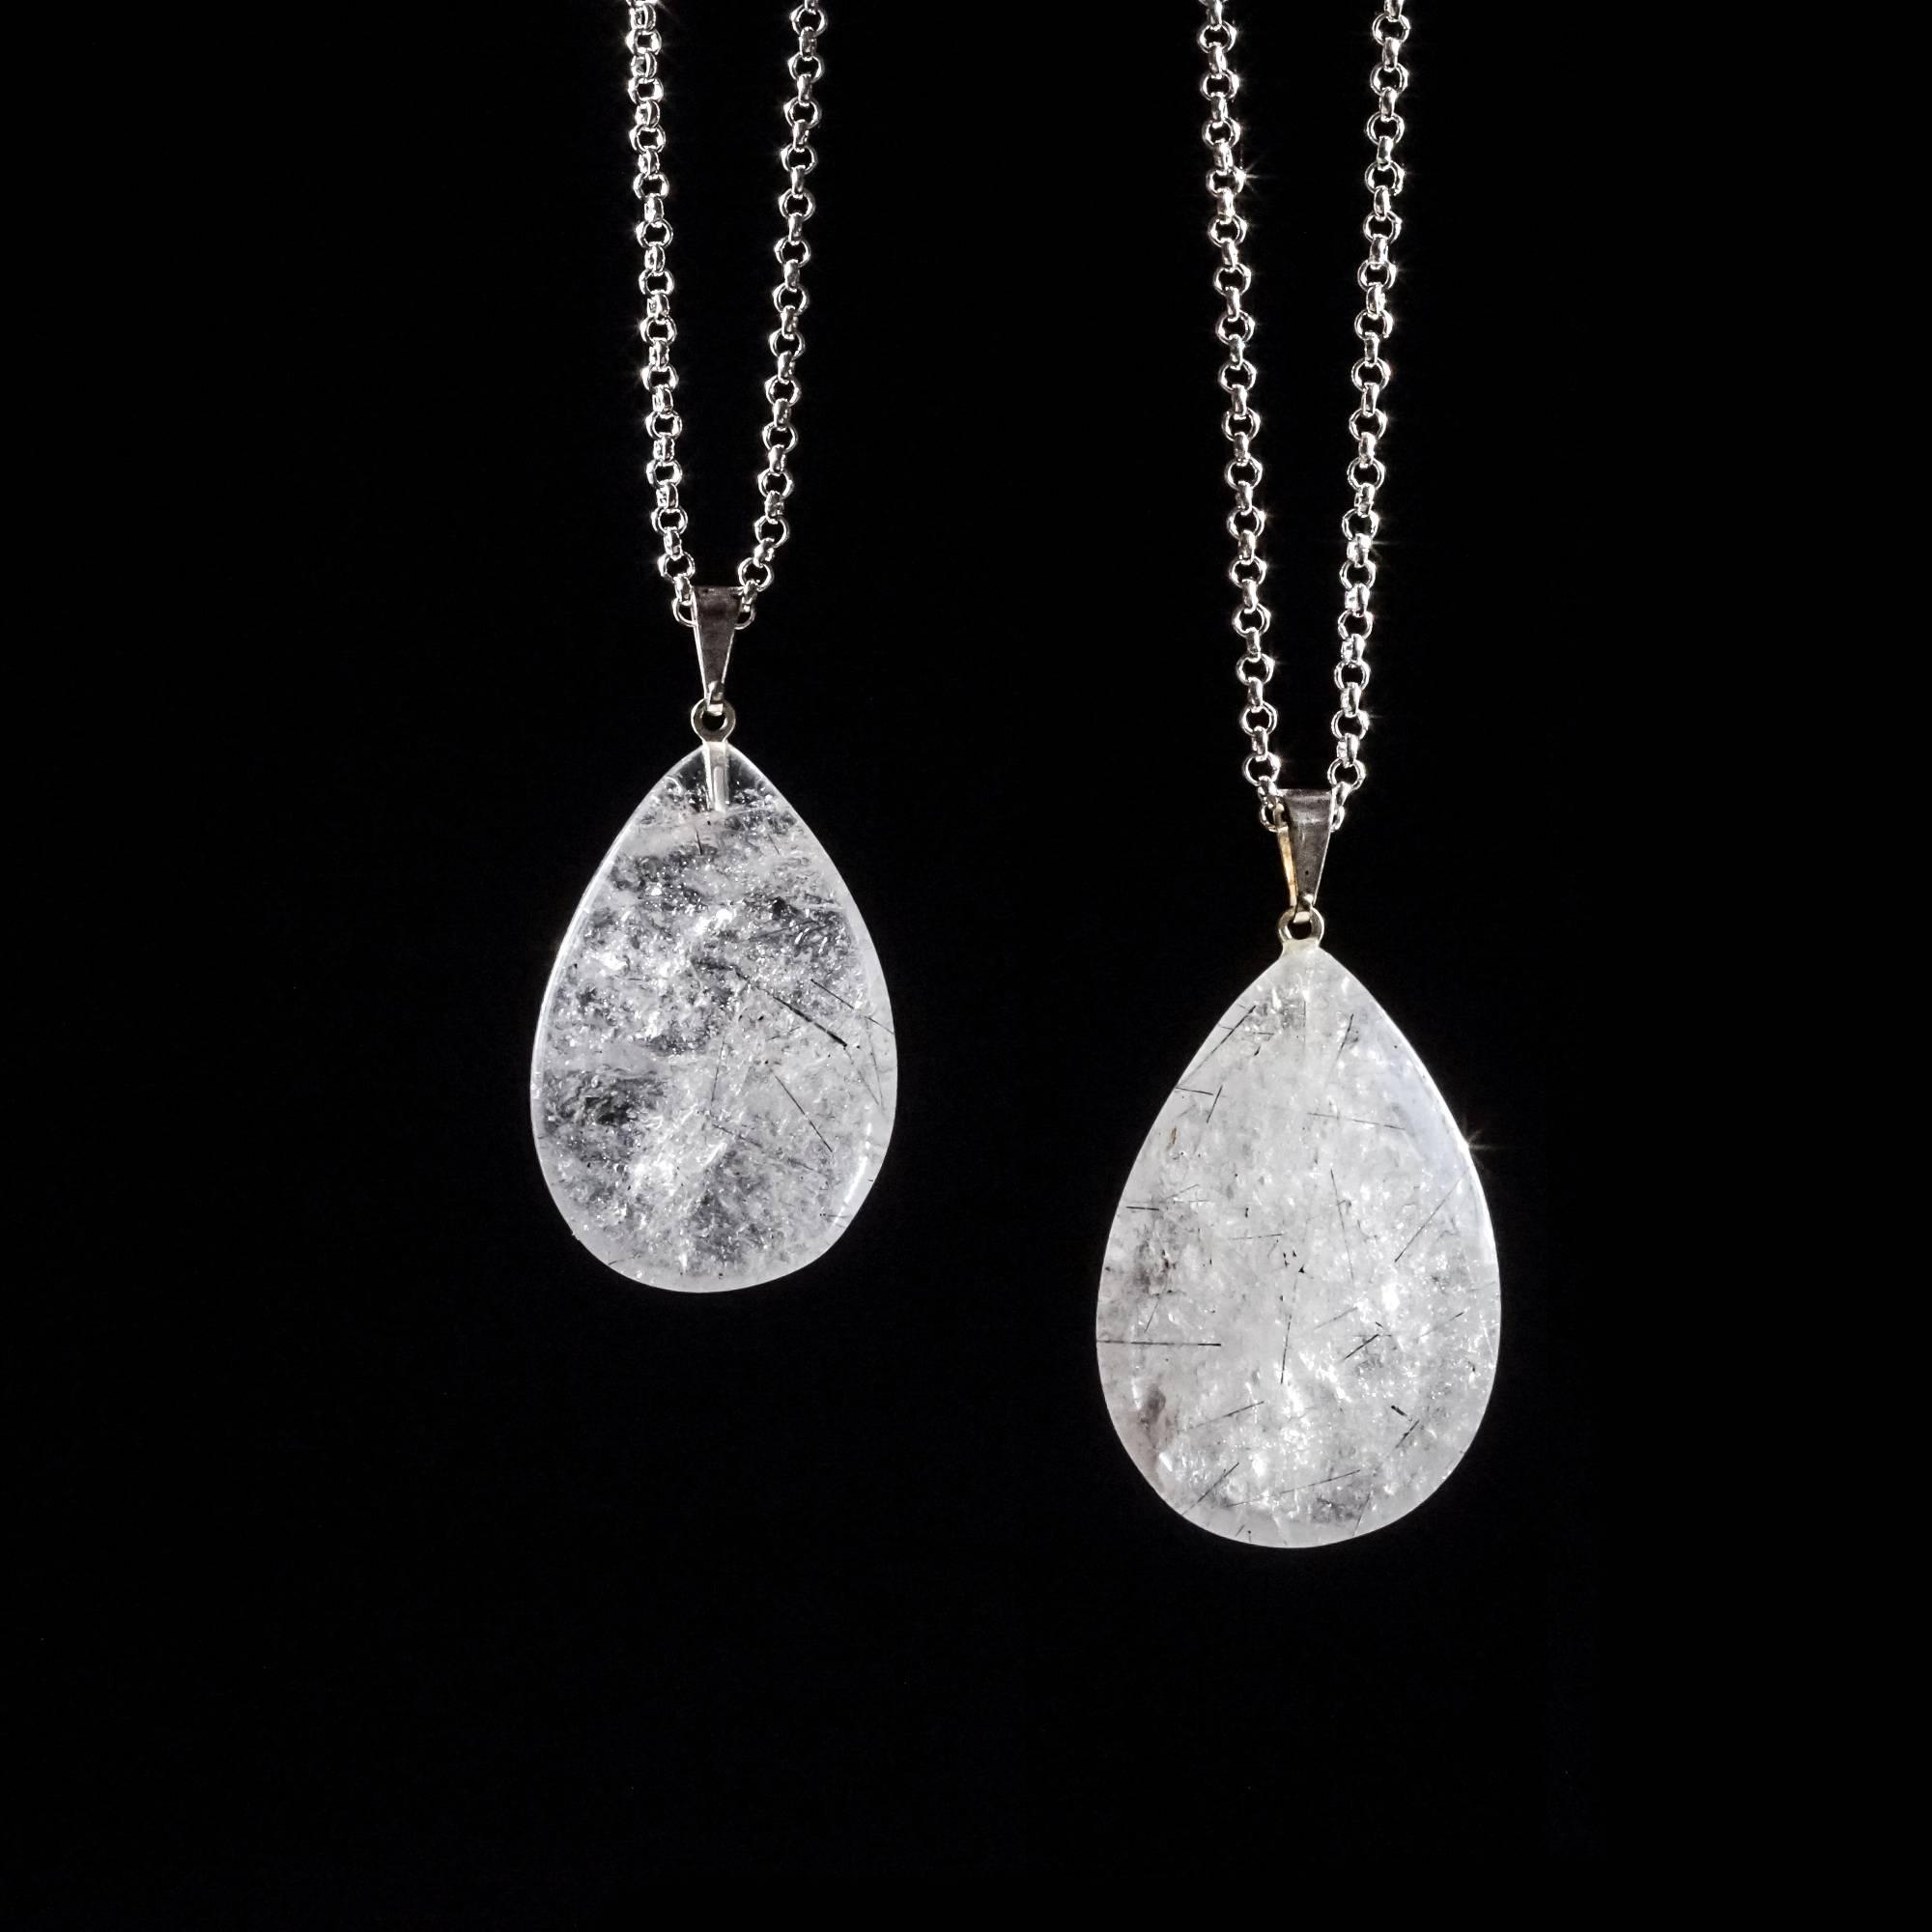 Tourmalinated quartz pendants to create a protective bubble of white tourmalinated quartz pendants to create a protective bubble of white light aloadofball Image collections